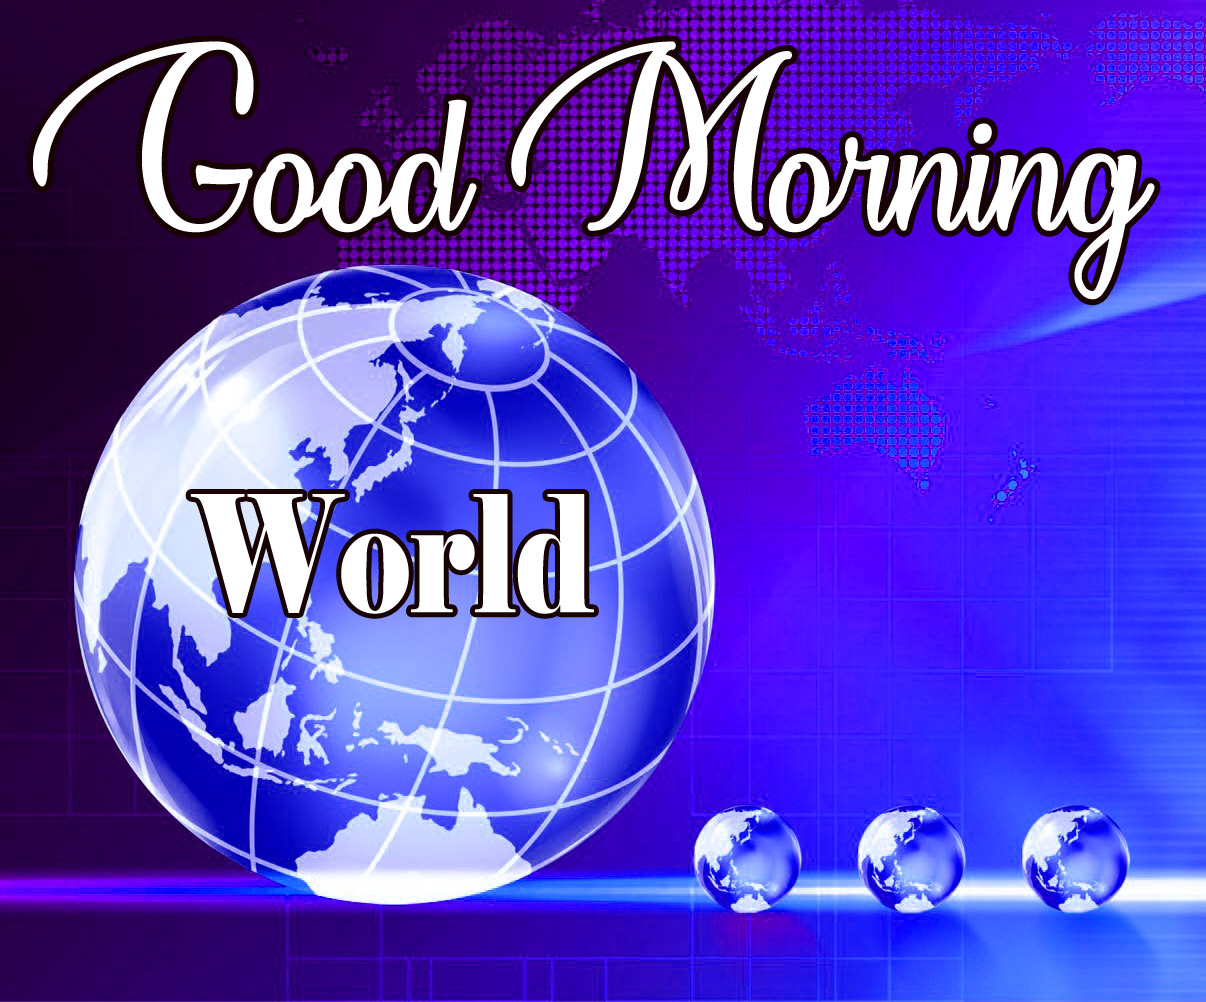 world good morning Images 7